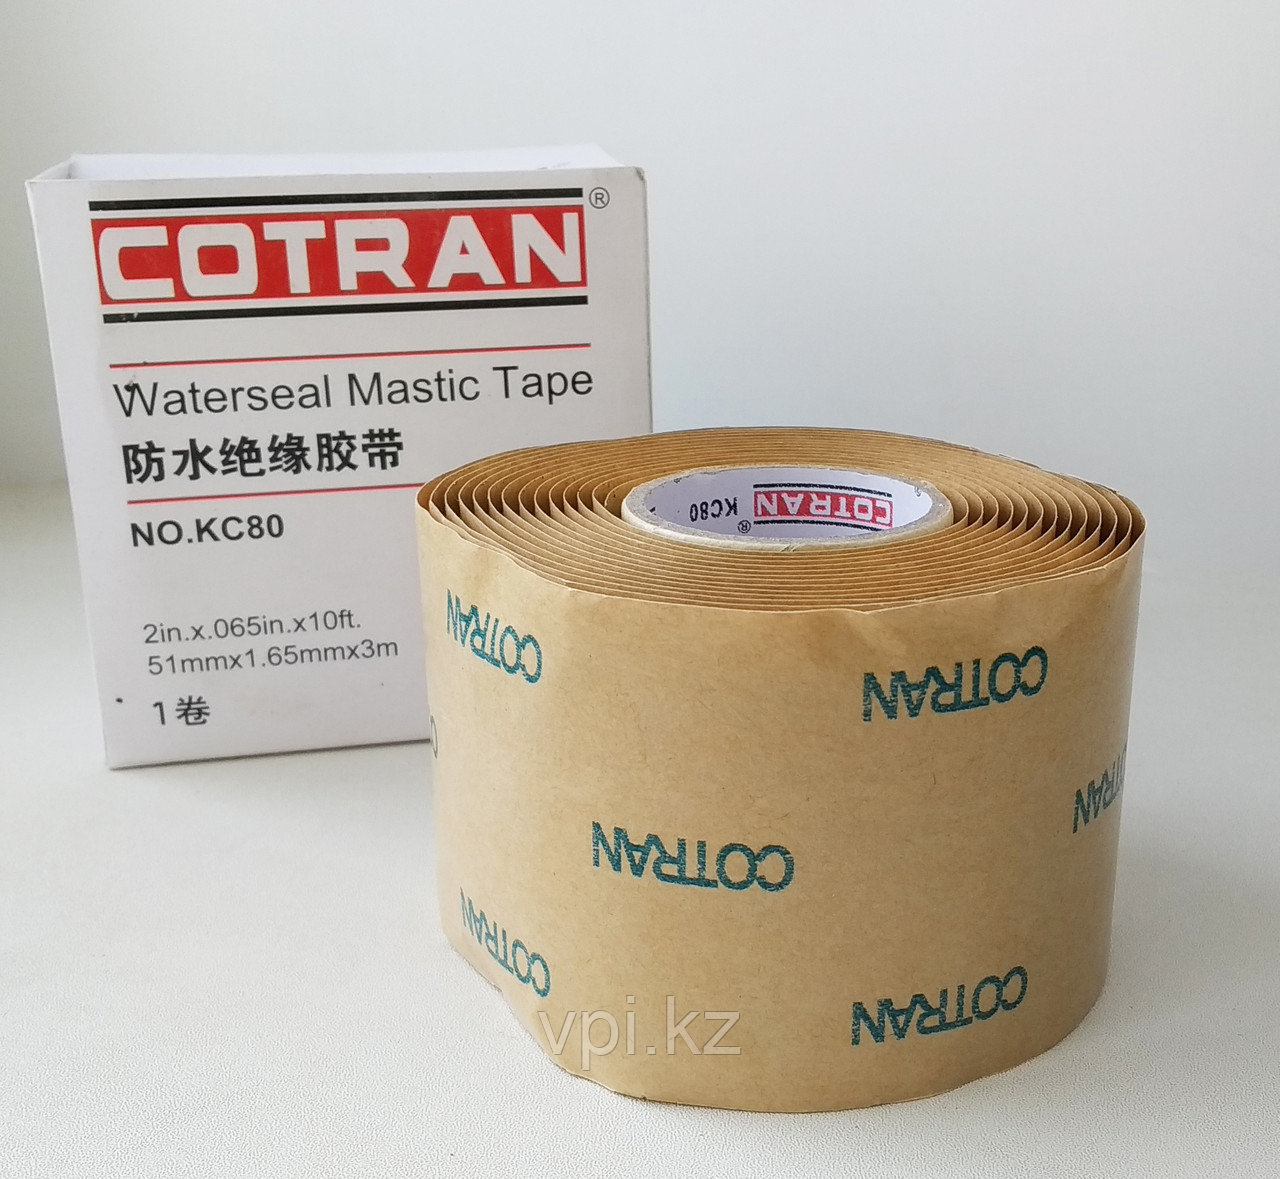 Изолента  резиново-мастичная 51мм*1.65мм*3м, COTRAN KC80